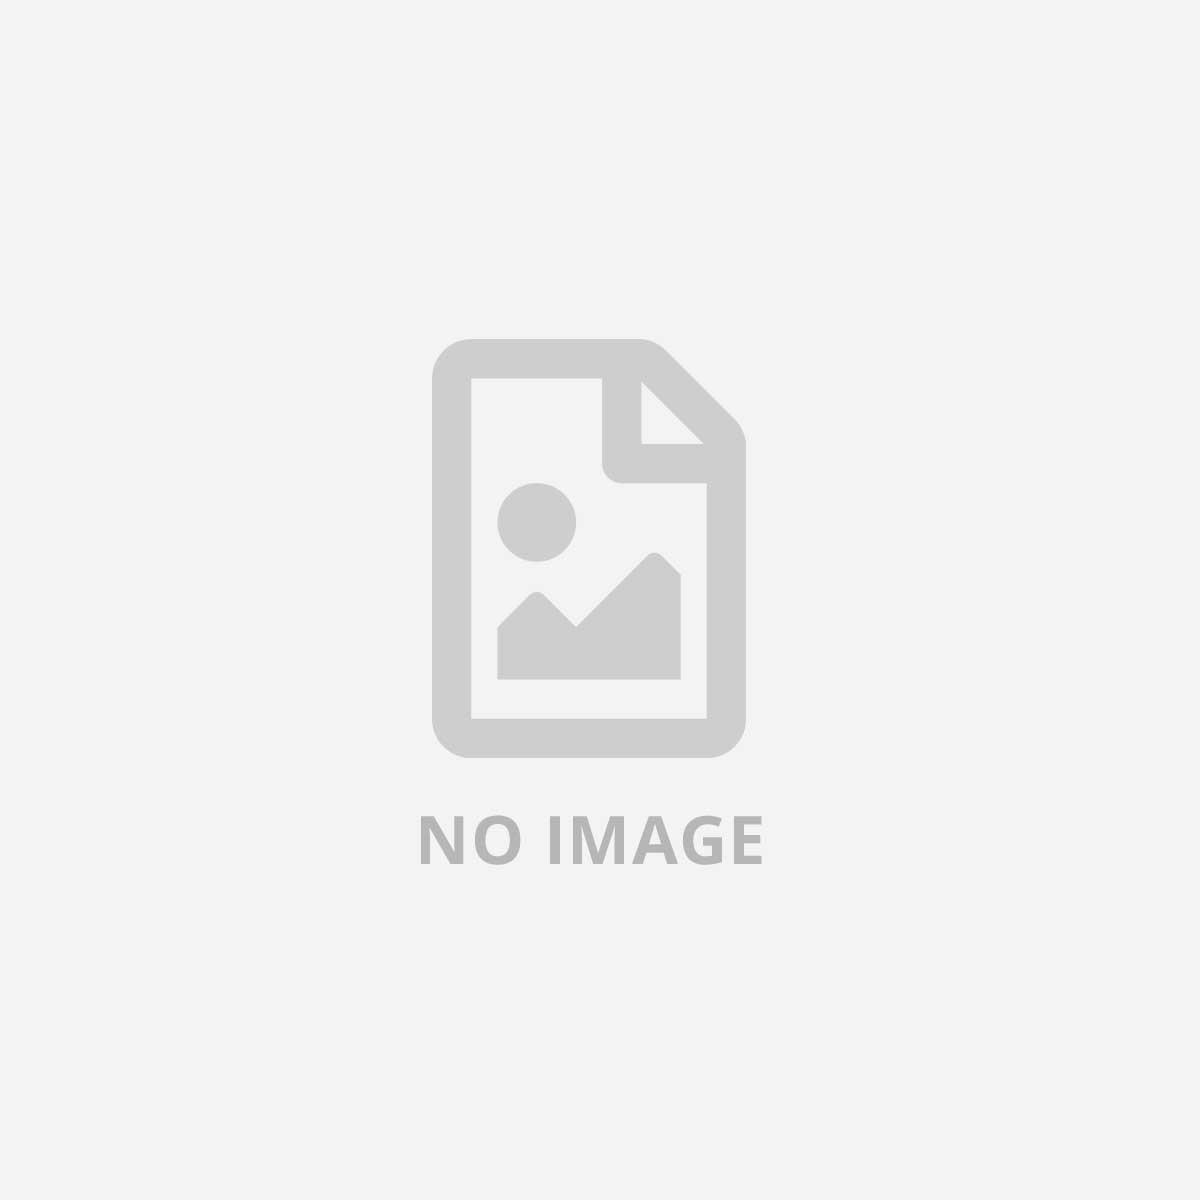 STARTECH BOX ESPANSIONE PCIE 4 SLOT PCI/PCIE